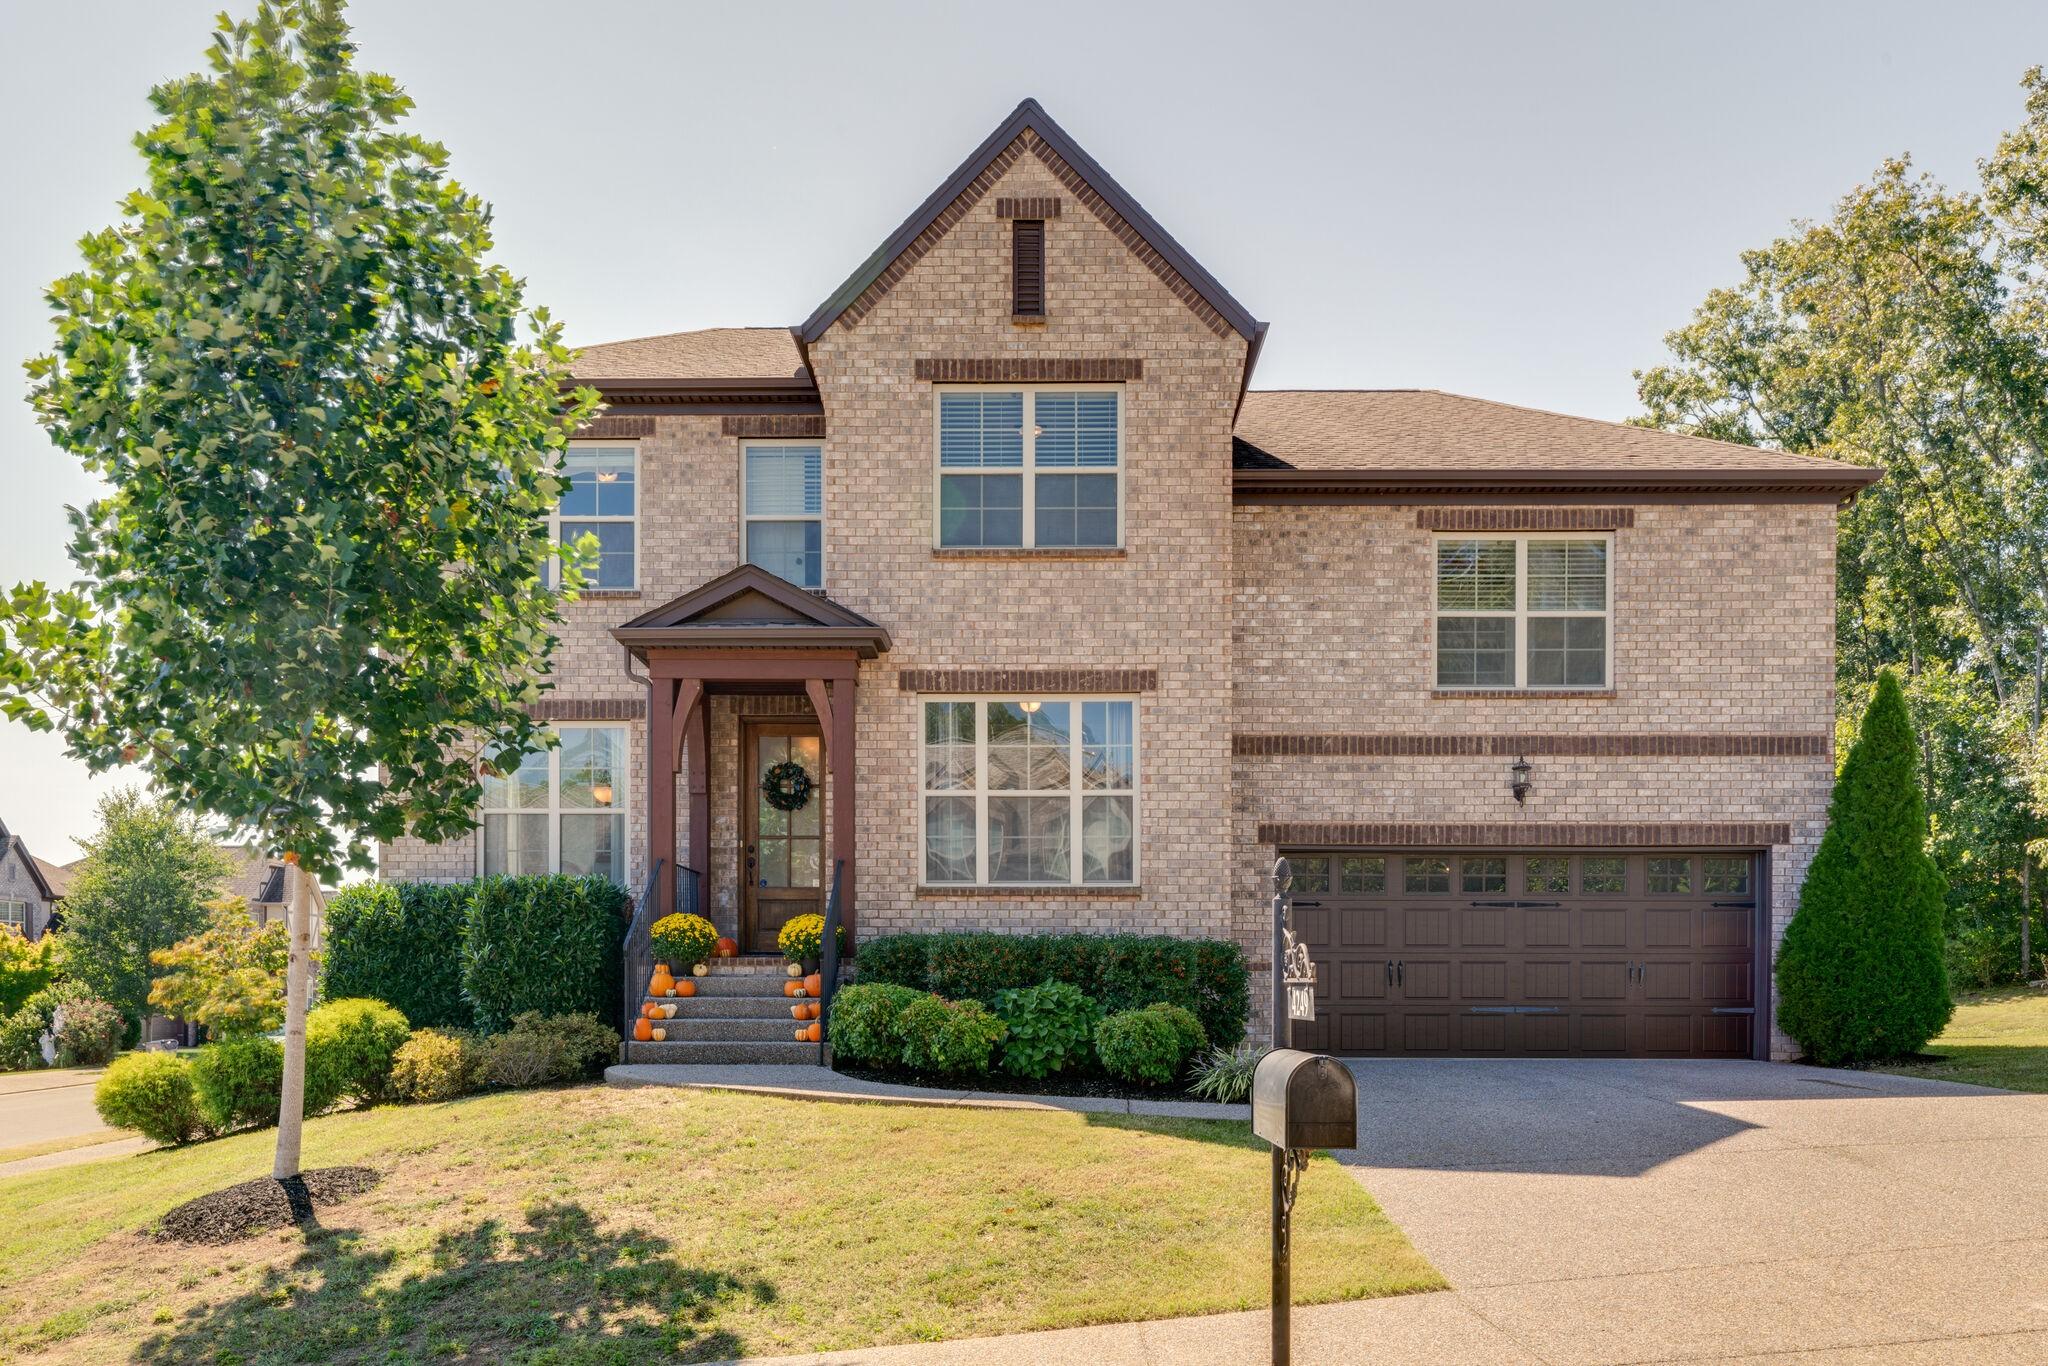 4249 Stone Hall Blvd Property Photo - Hermitage, TN real estate listing